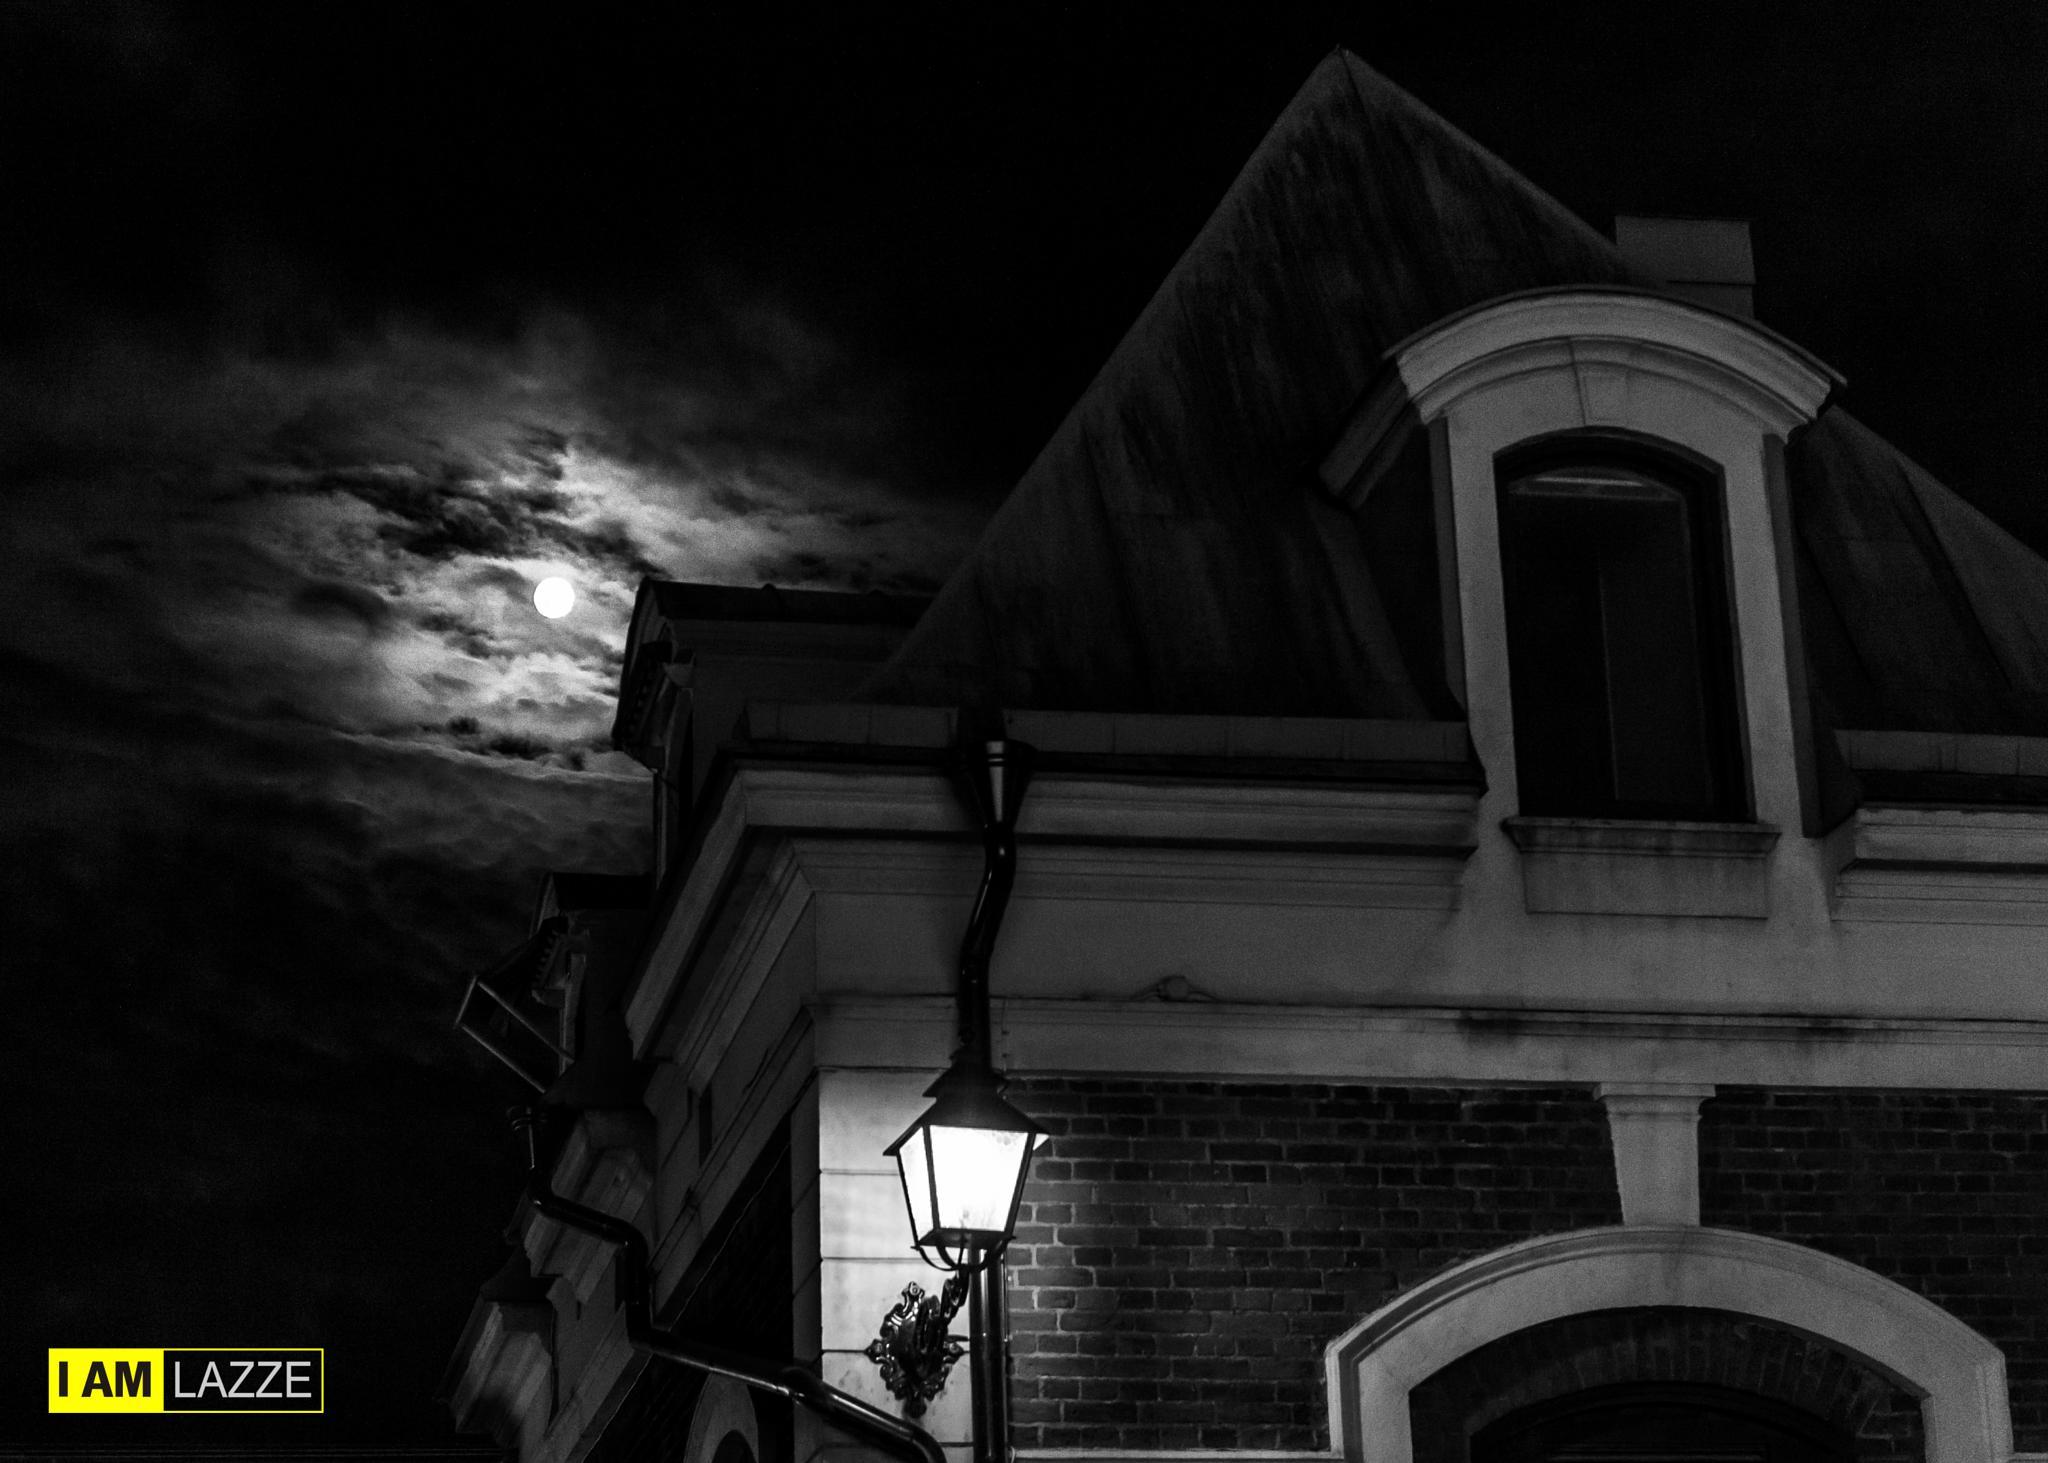 Under the moon by IAMLAZZE